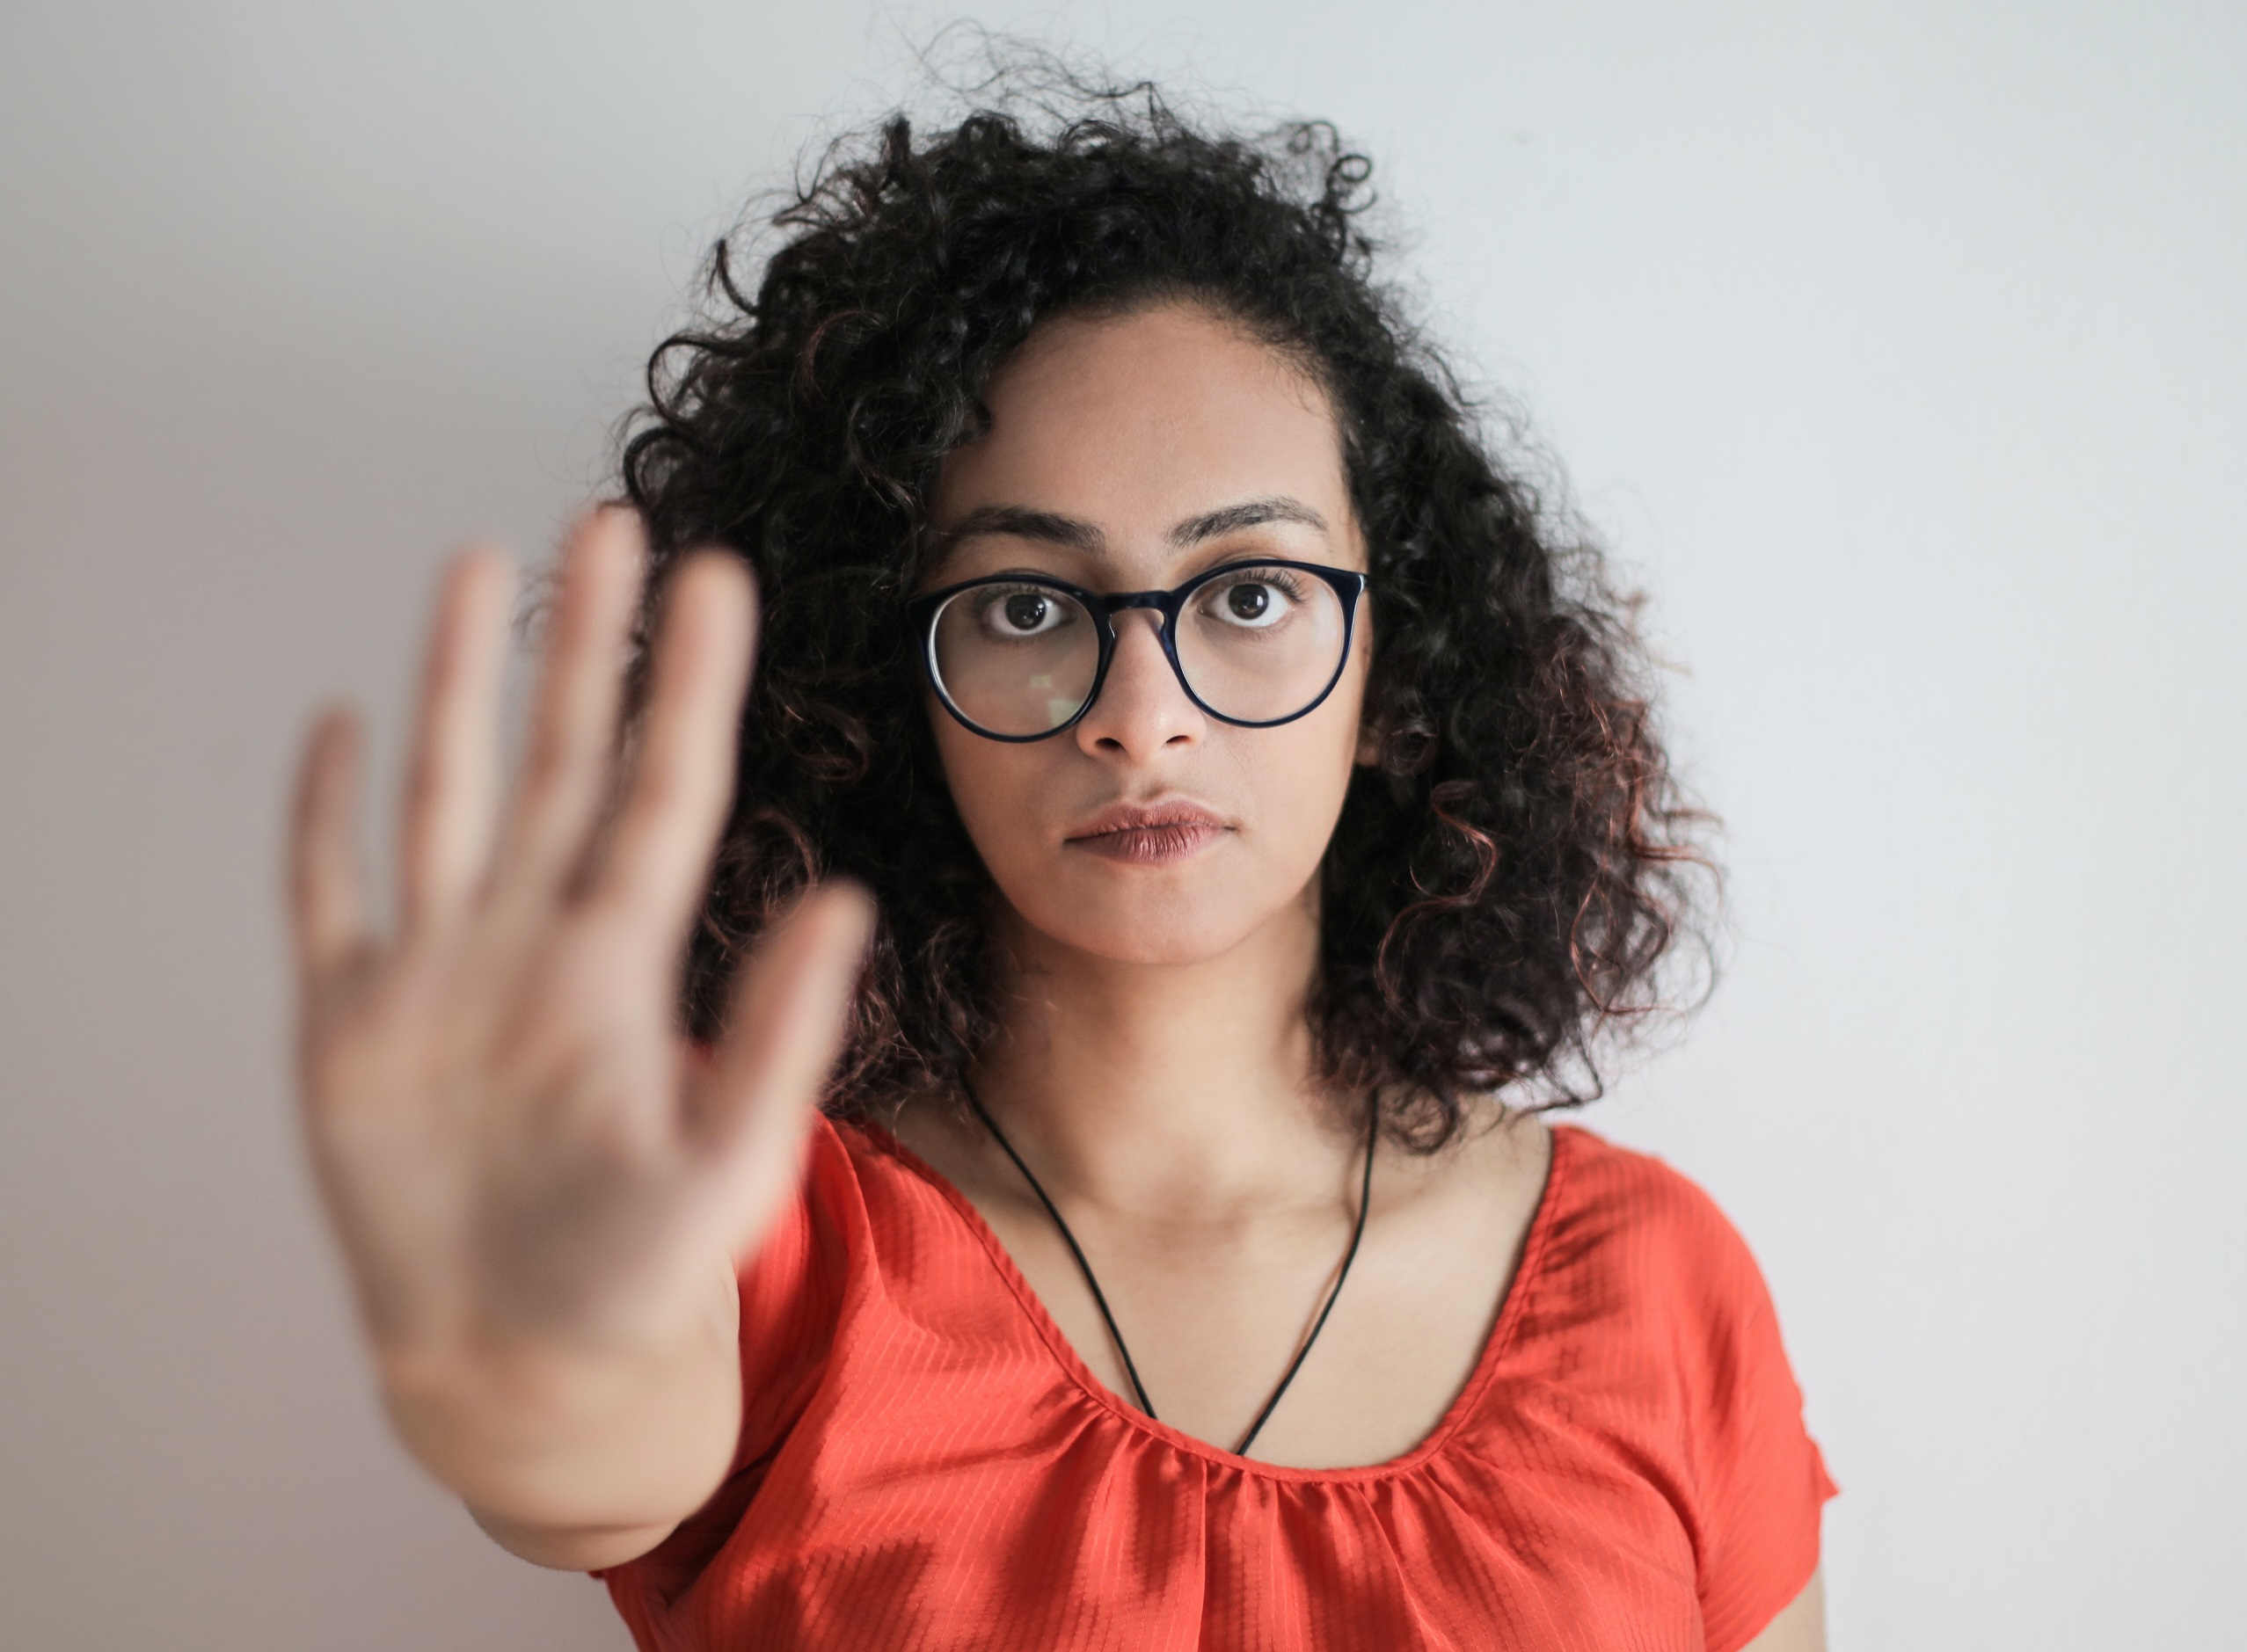 eliminate discrimination at Workplace